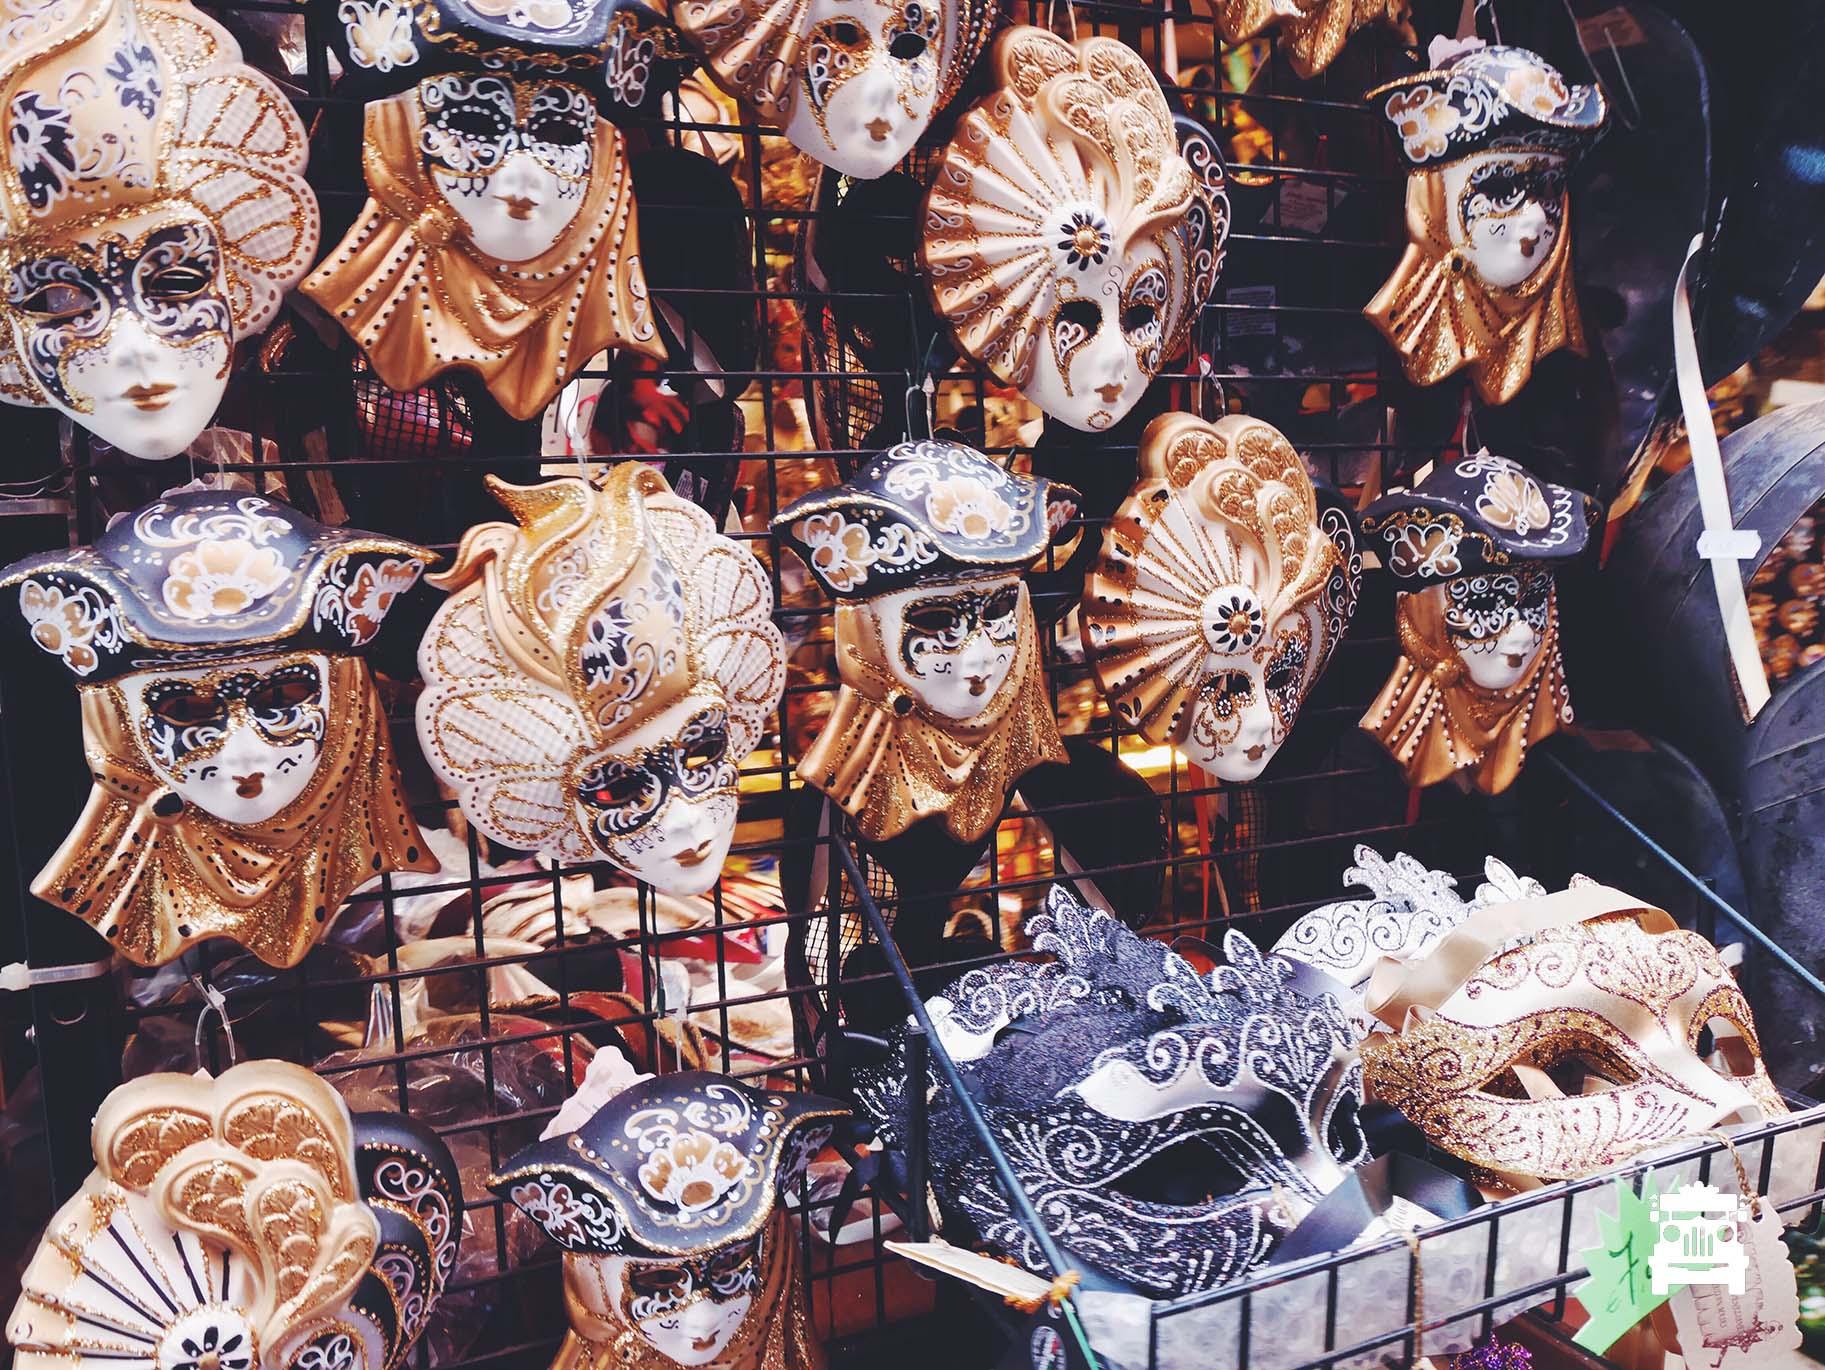 Venetian masks are a plenty